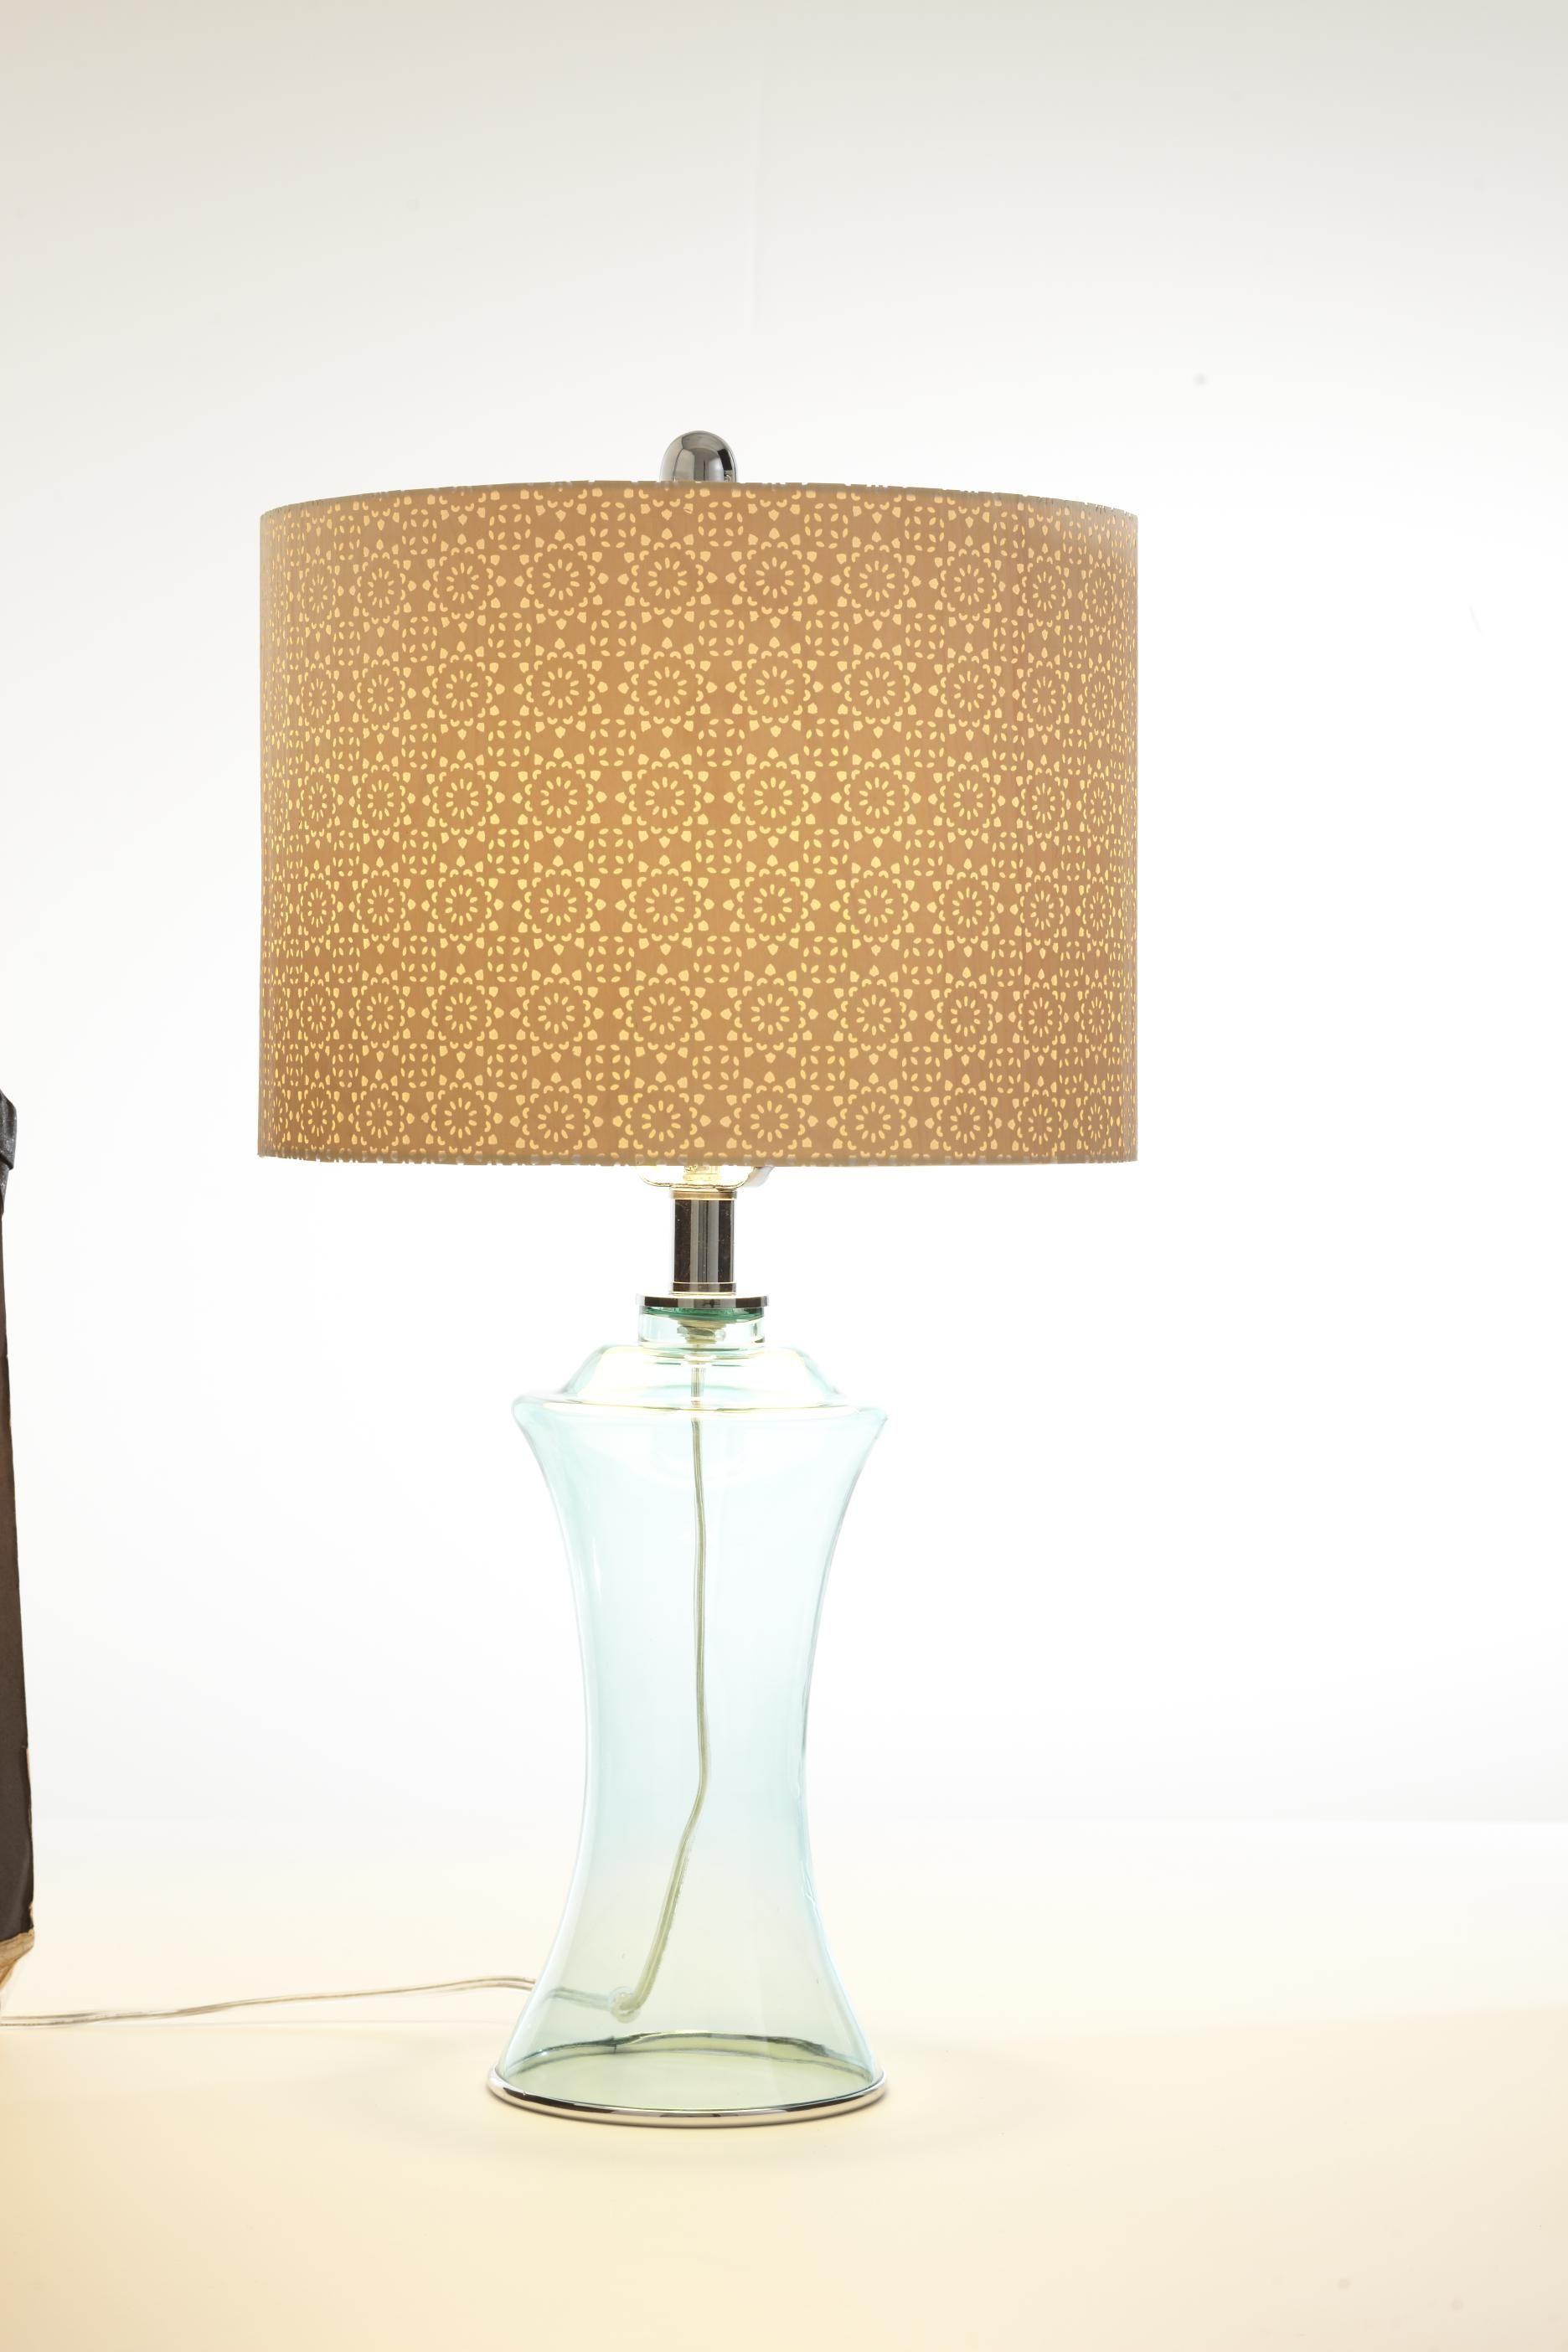 DIY Handmade Lampshade #crafts #decor